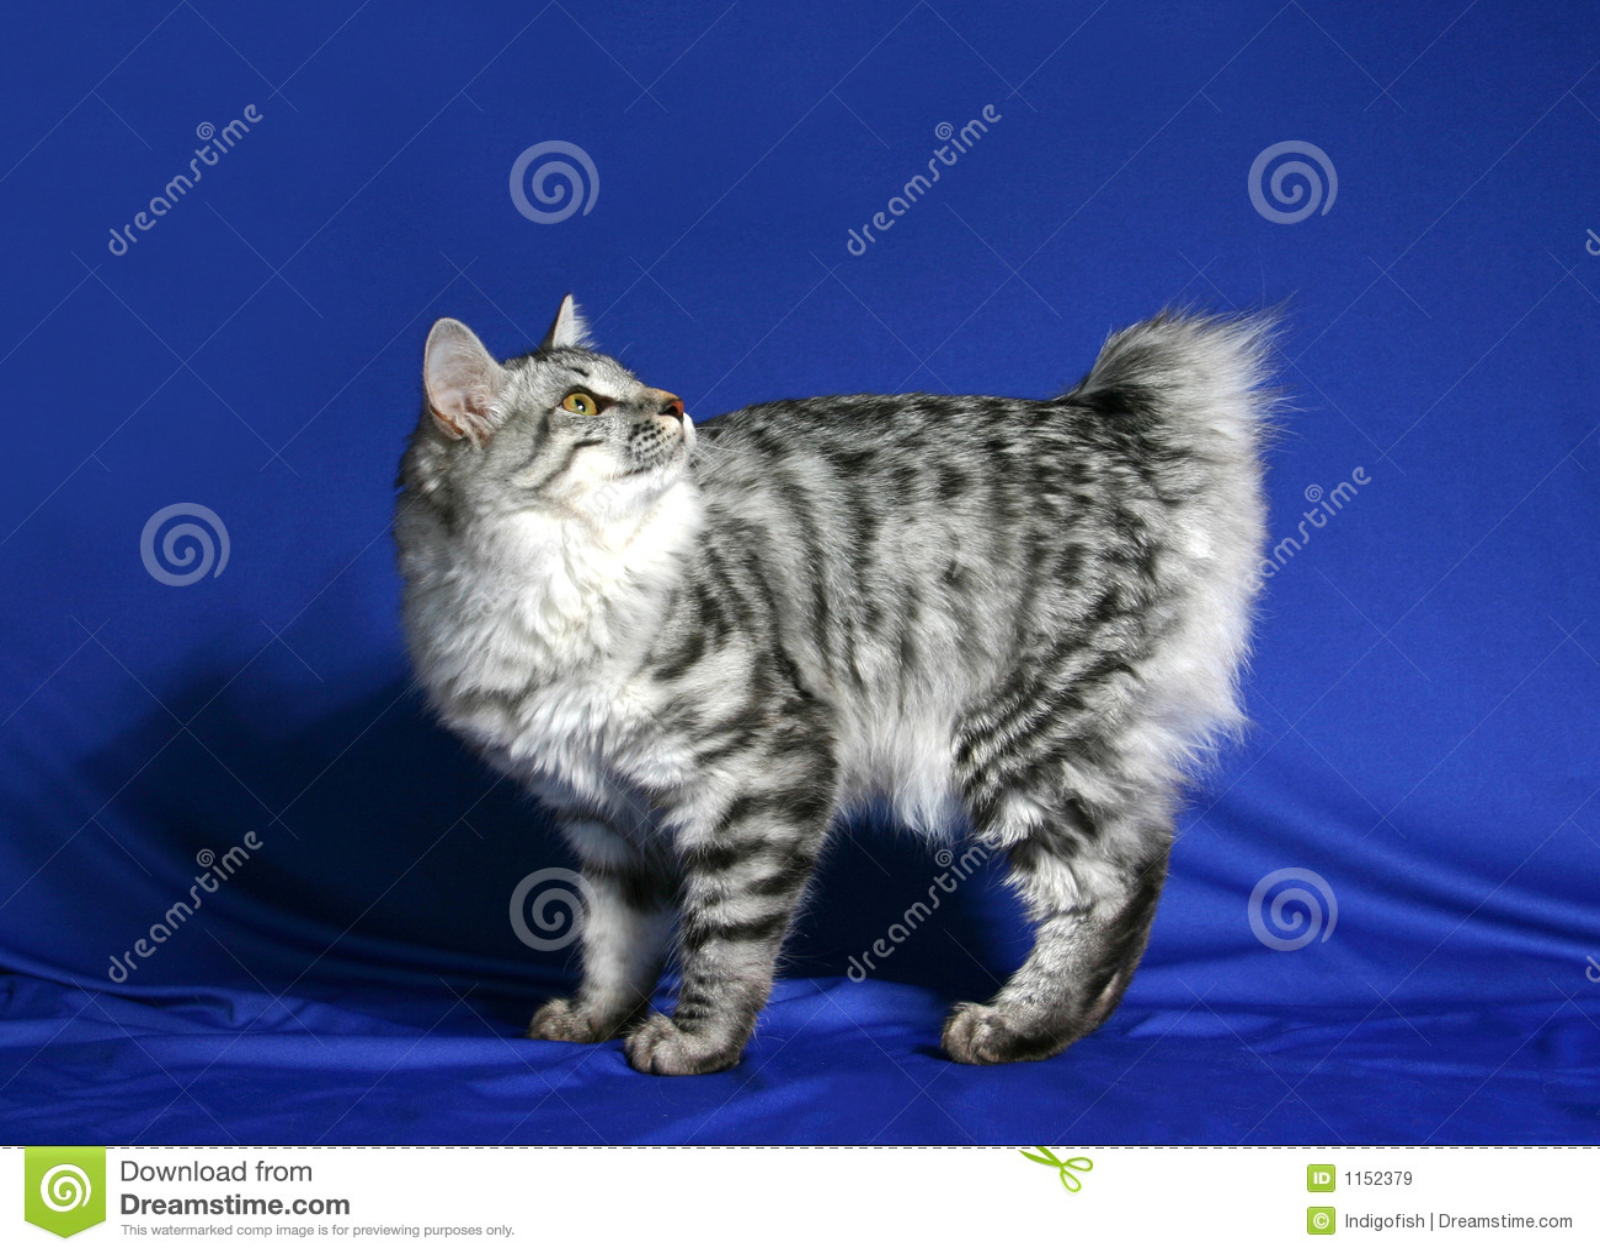 Cat of breed Kuril bobtail